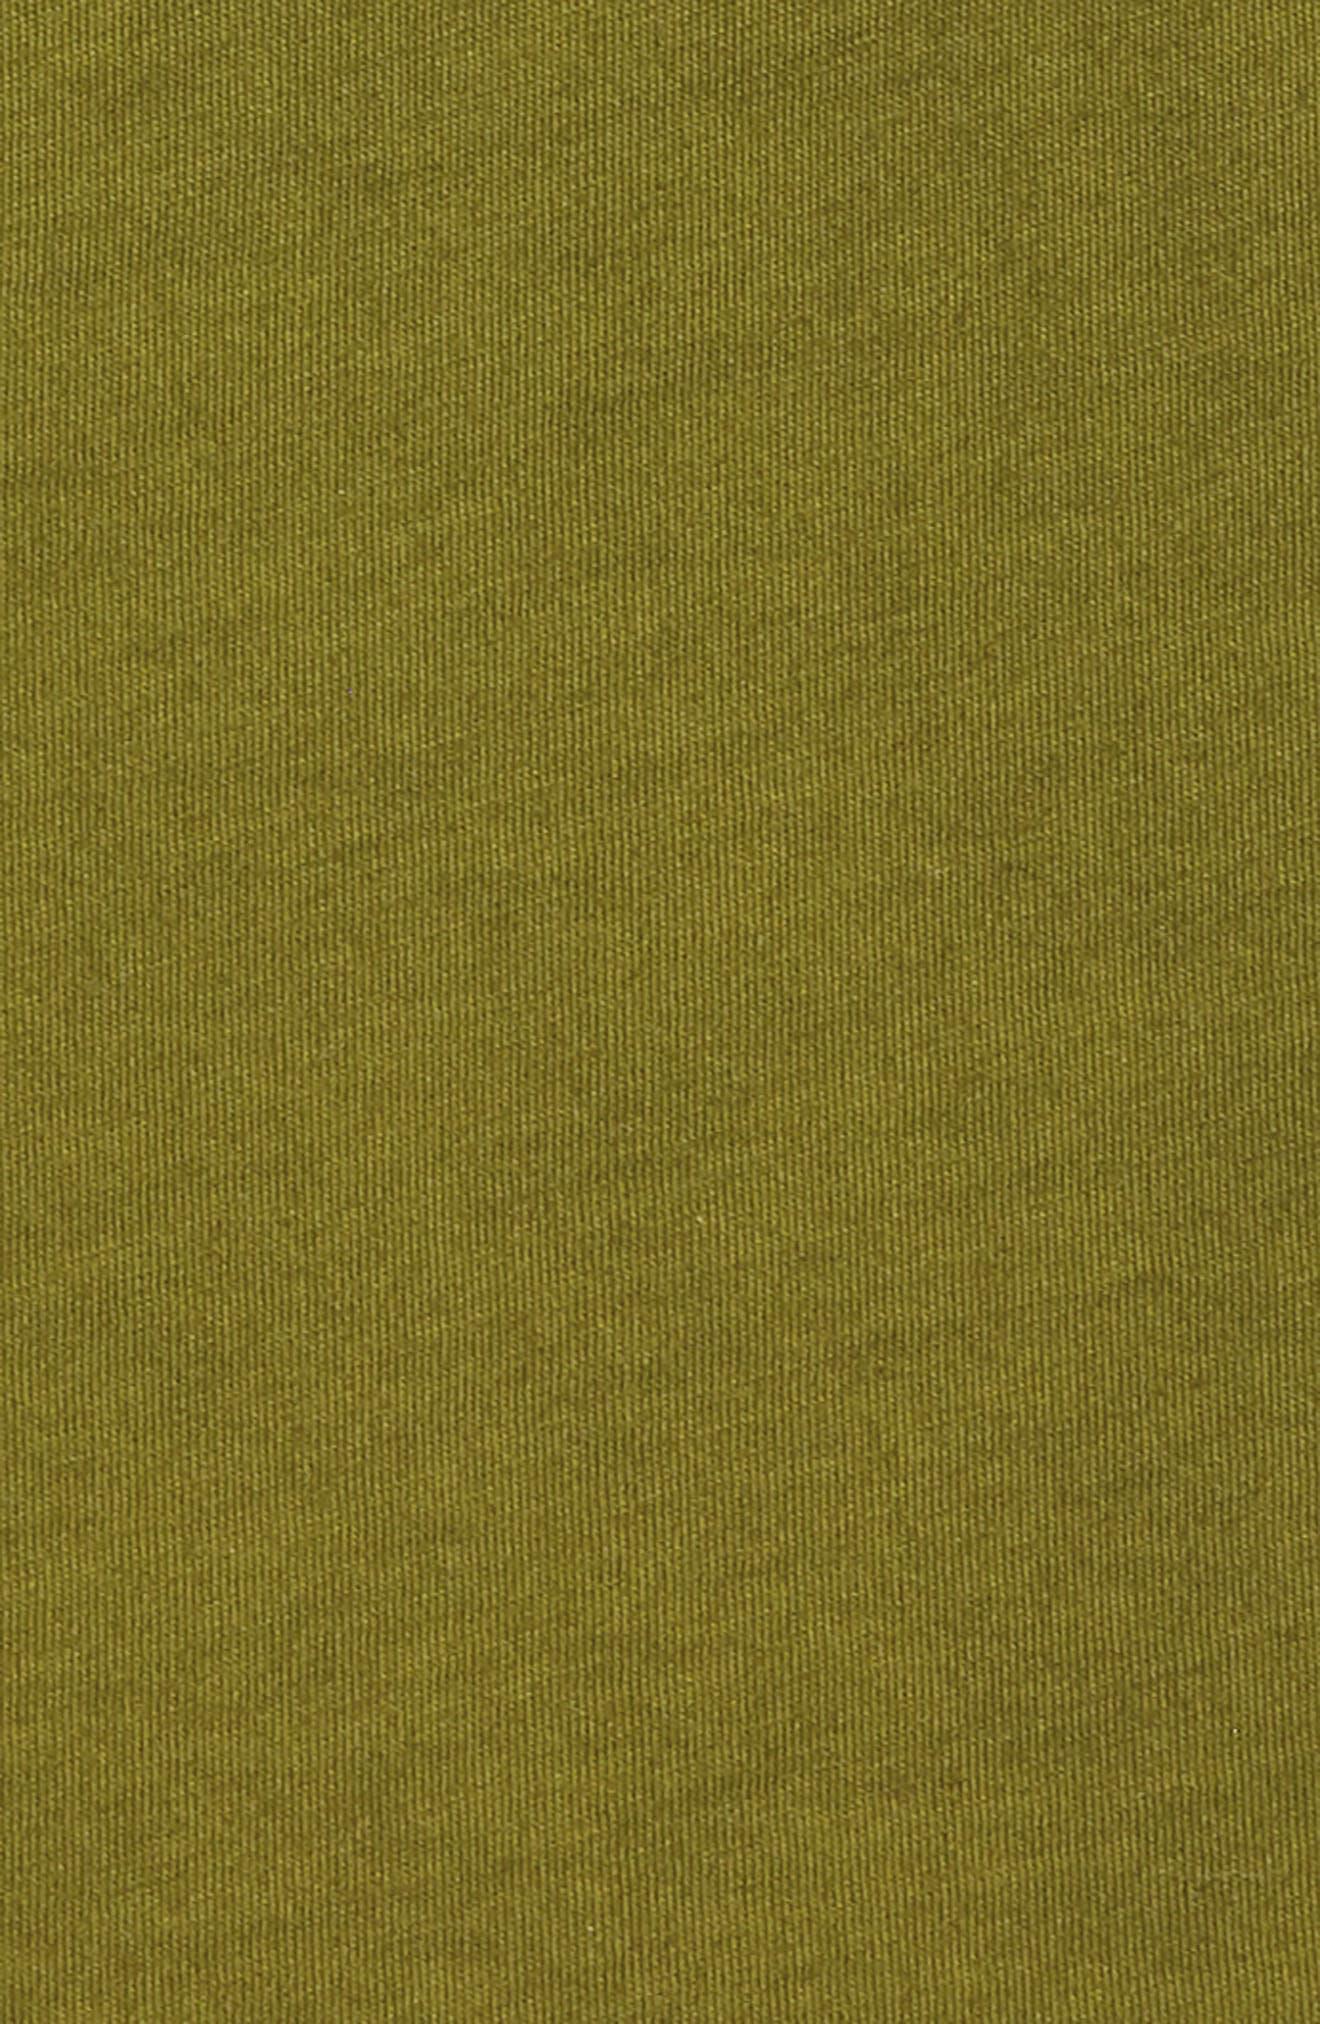 Diagonal Tank,                             Alternate thumbnail 2, color,                             Rusty Green